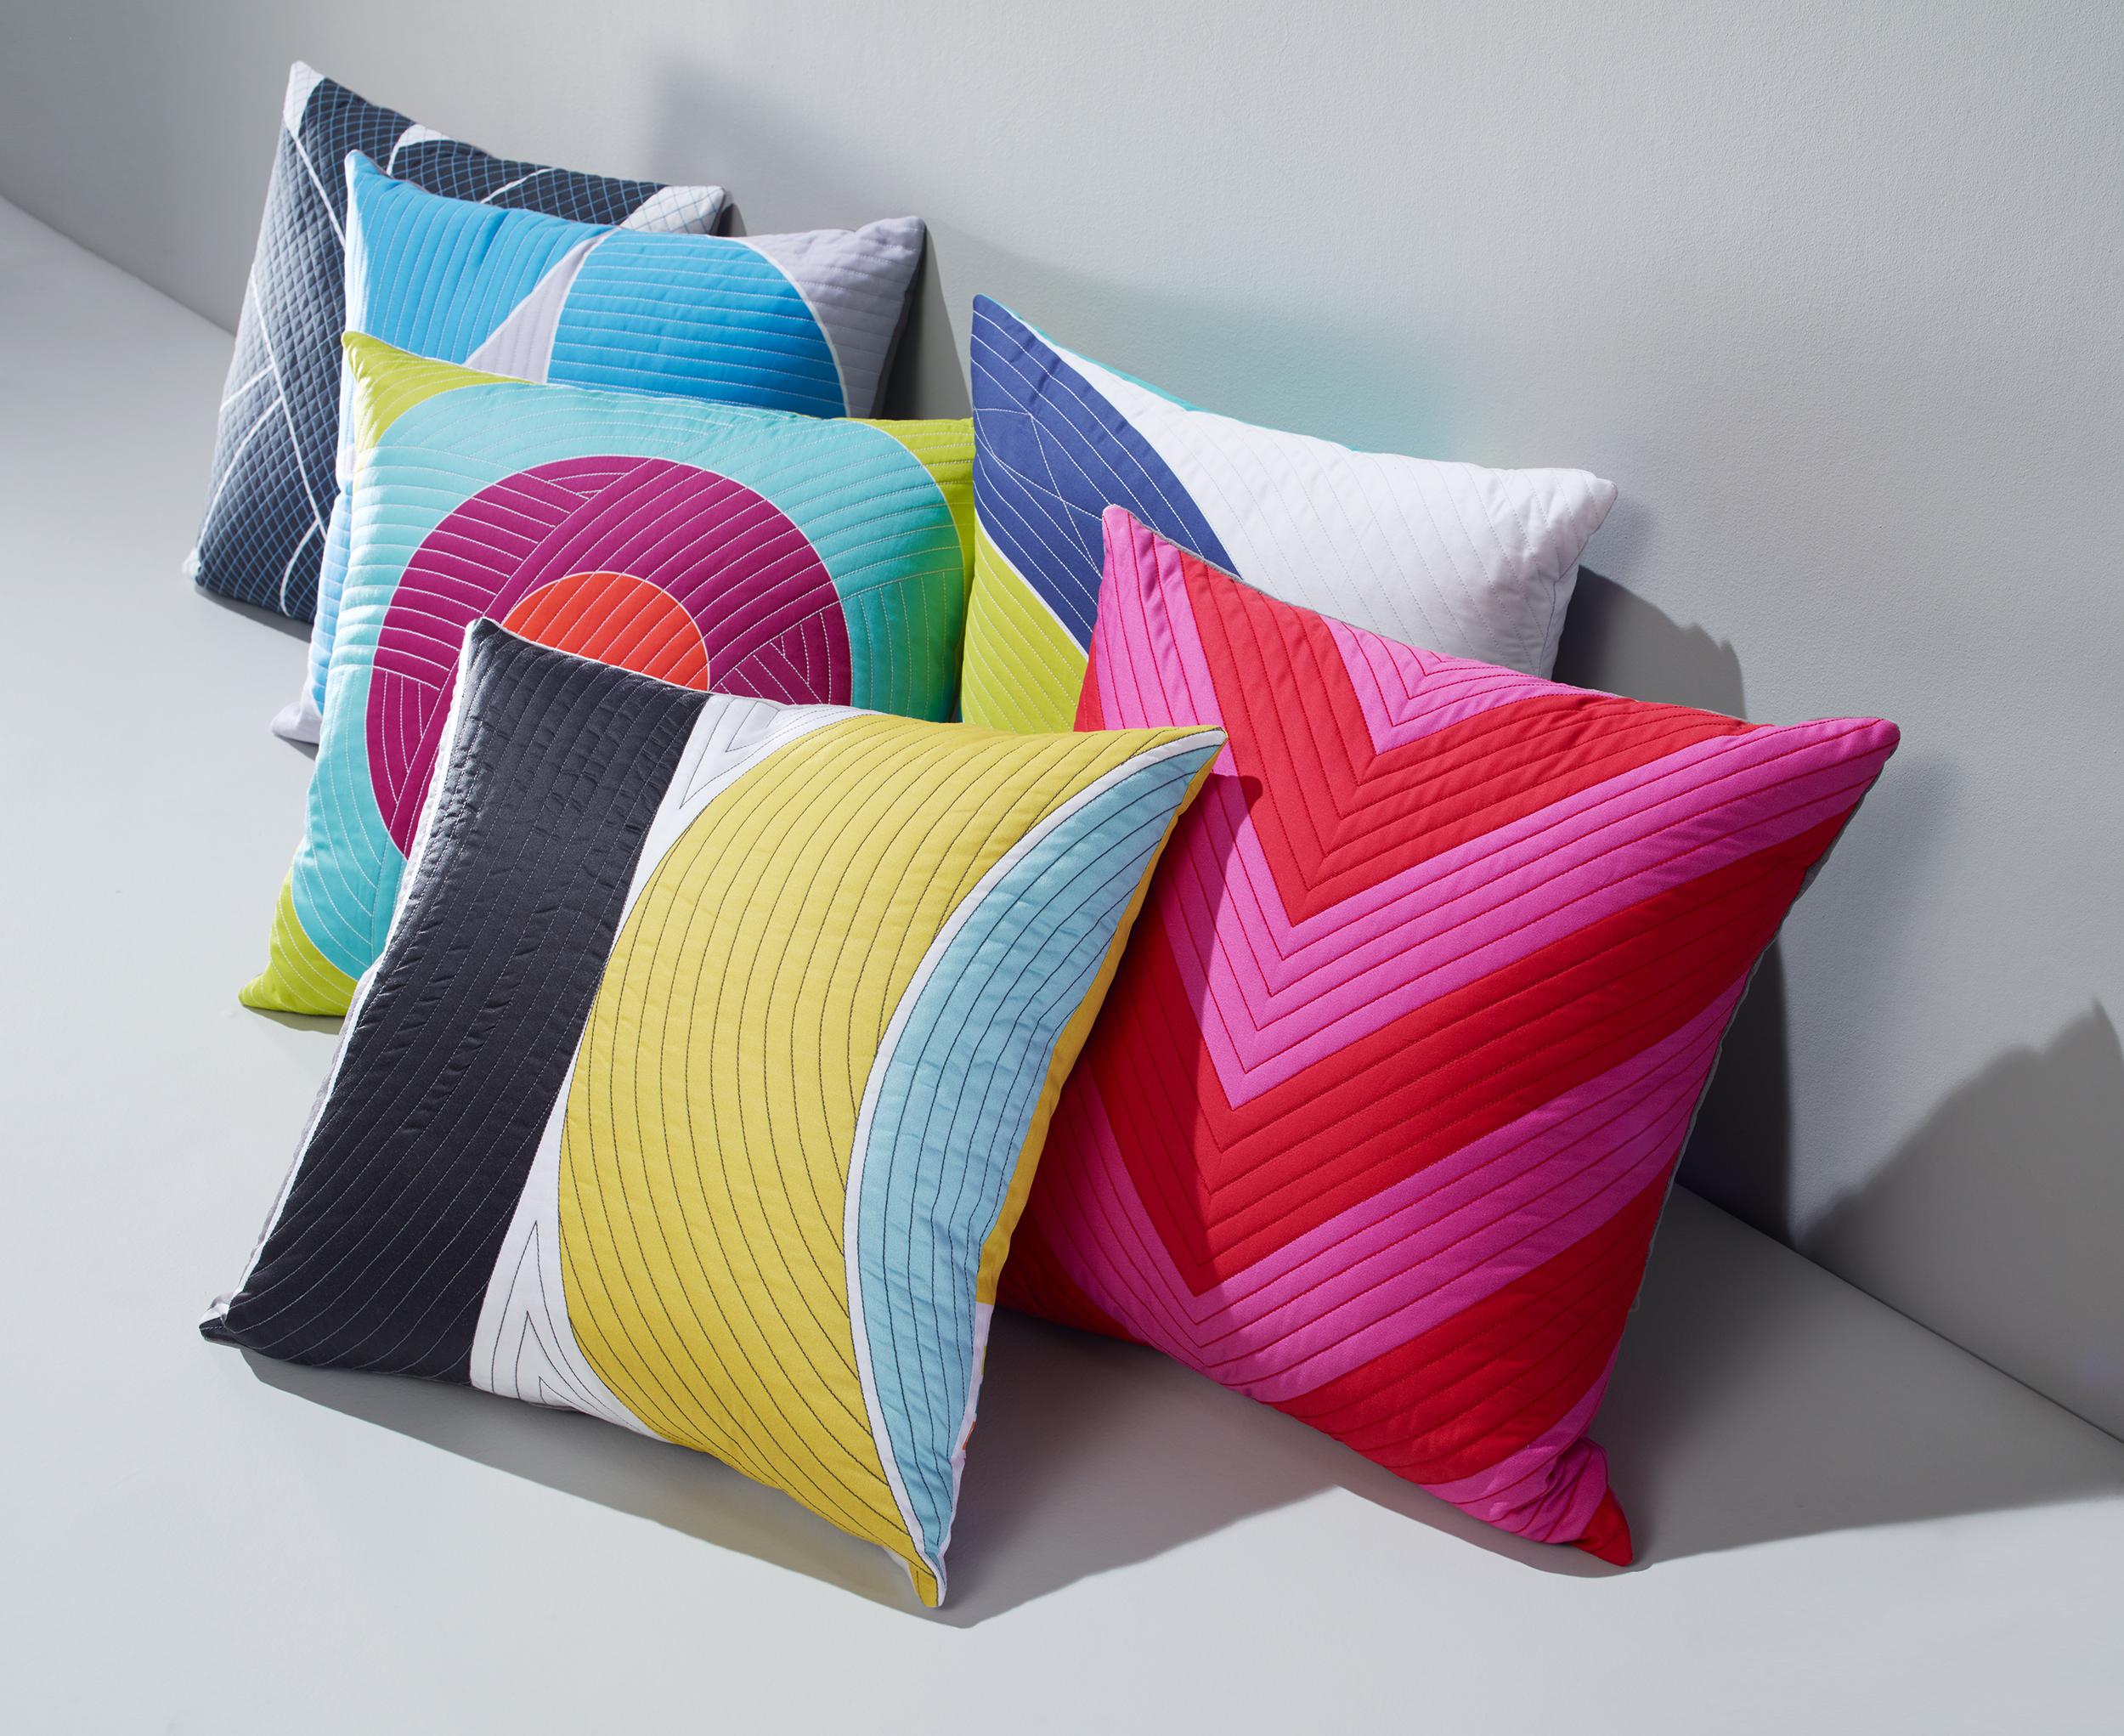 Pillows_Family_LowAndJaunty_COMP_Oa_2500pxl.jpg